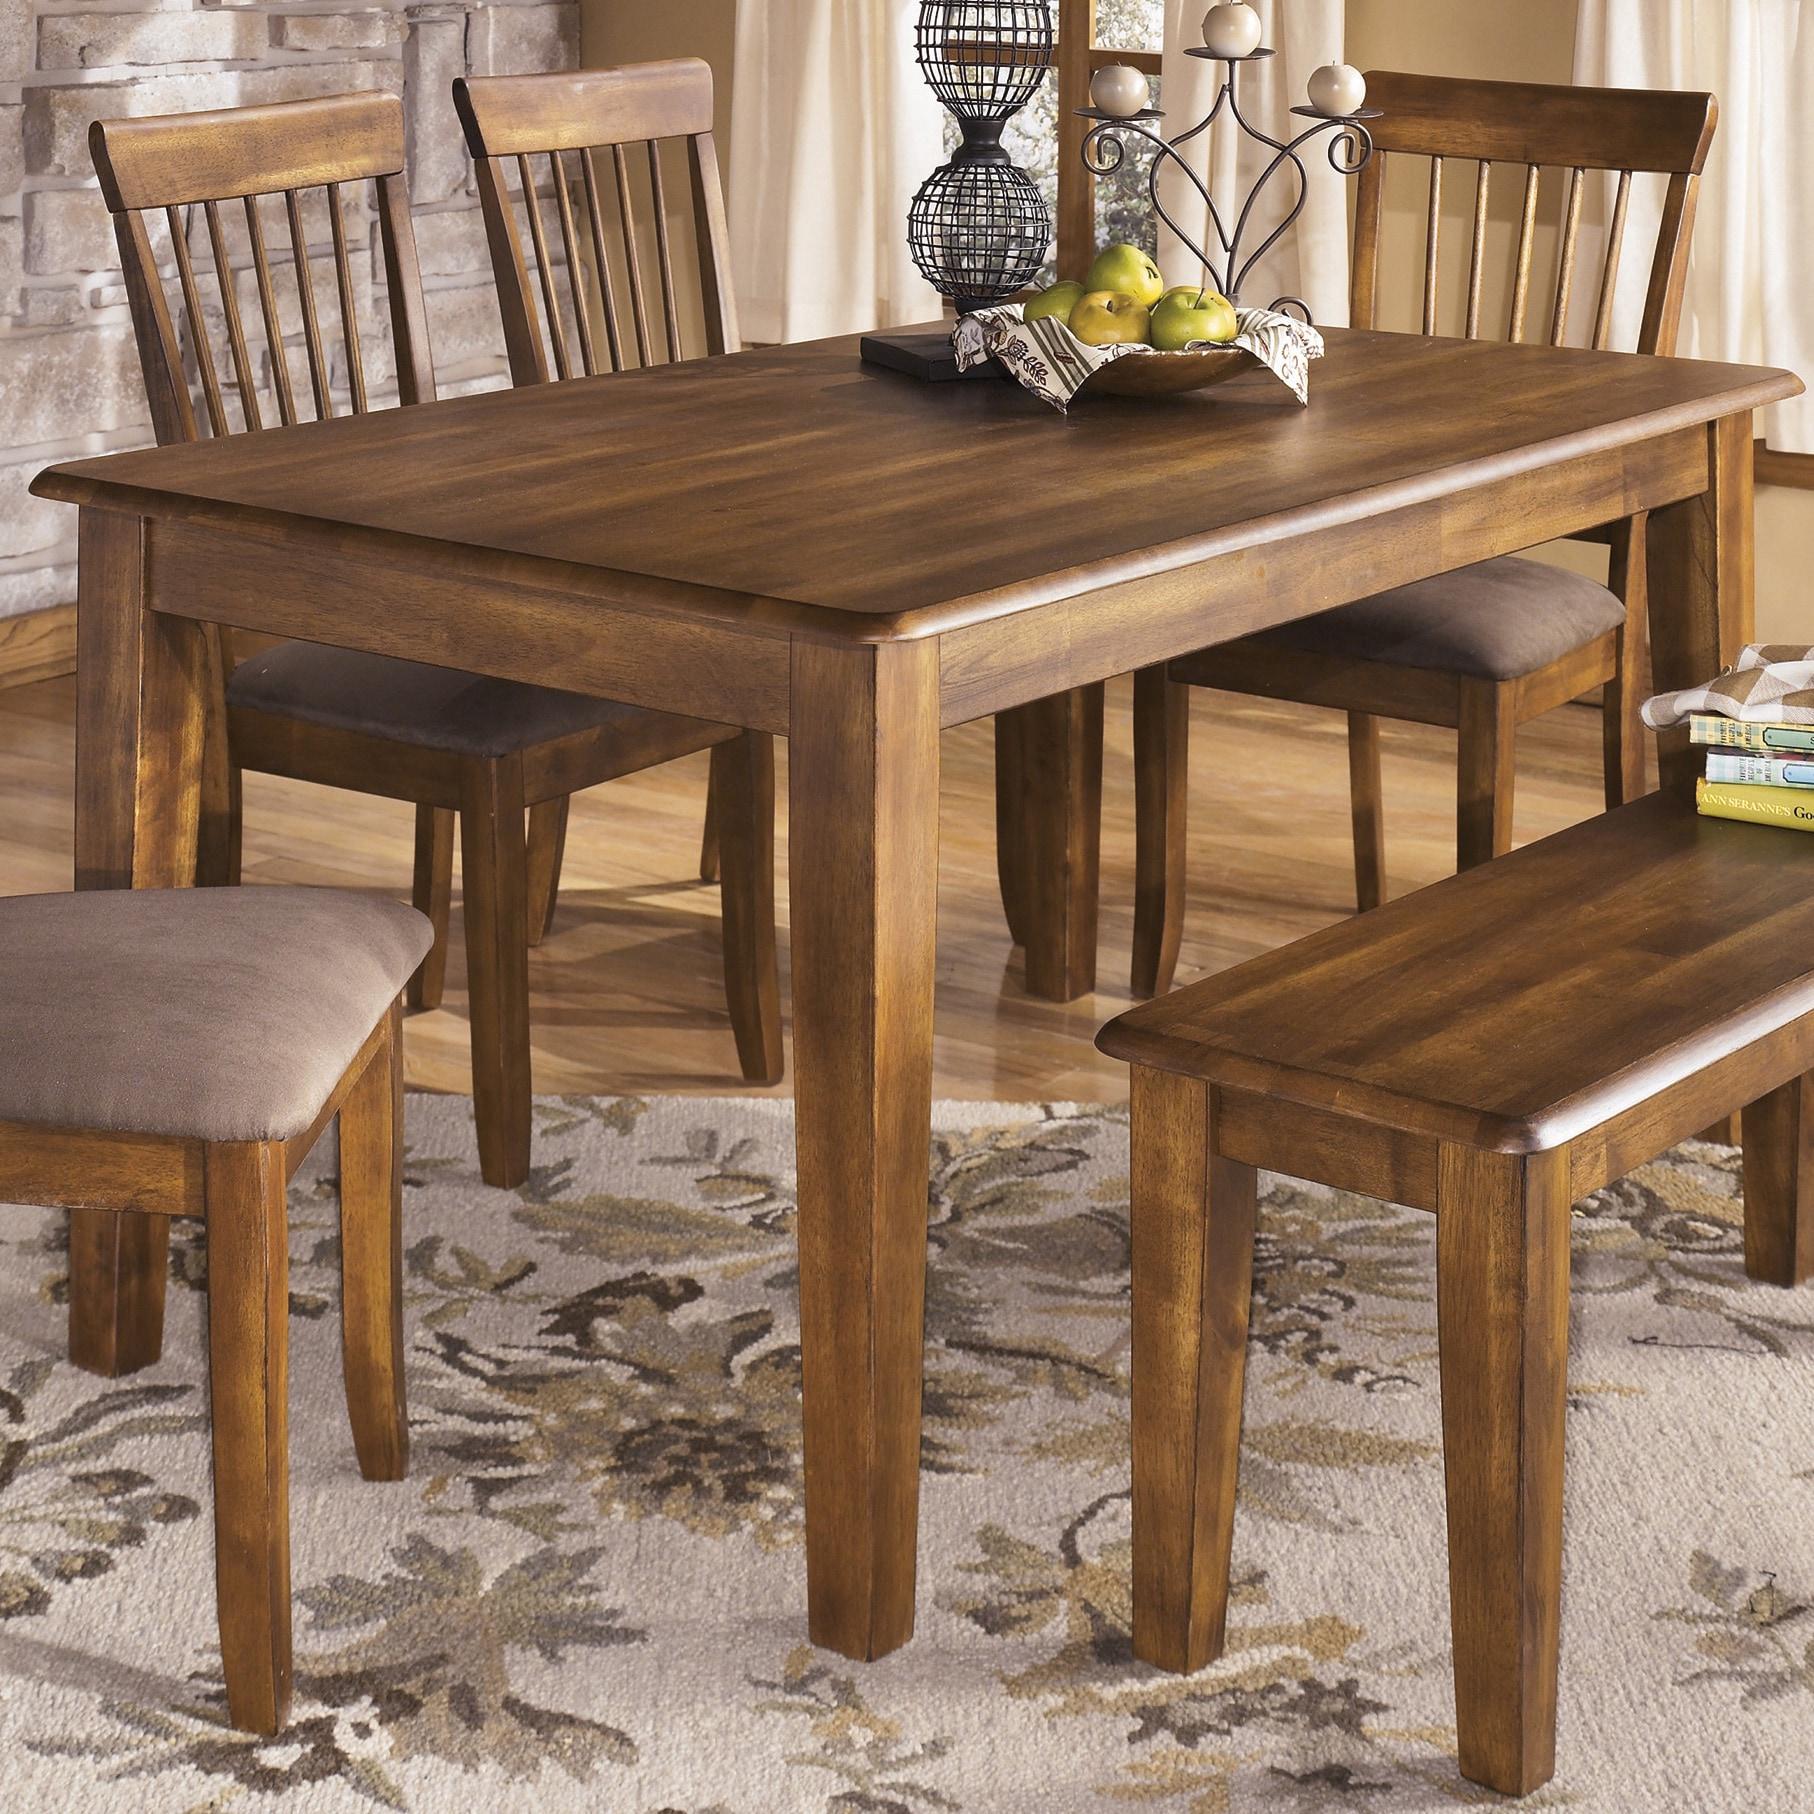 https://ak1.ostkcdn.com//images/products/9038965/Signature-Designs-by-Ashley-Berringer-Rectangular-Dining-Room-Table-c44d65b3-96a7-45a5-8c35-c3ed5b9b3f17.jpg